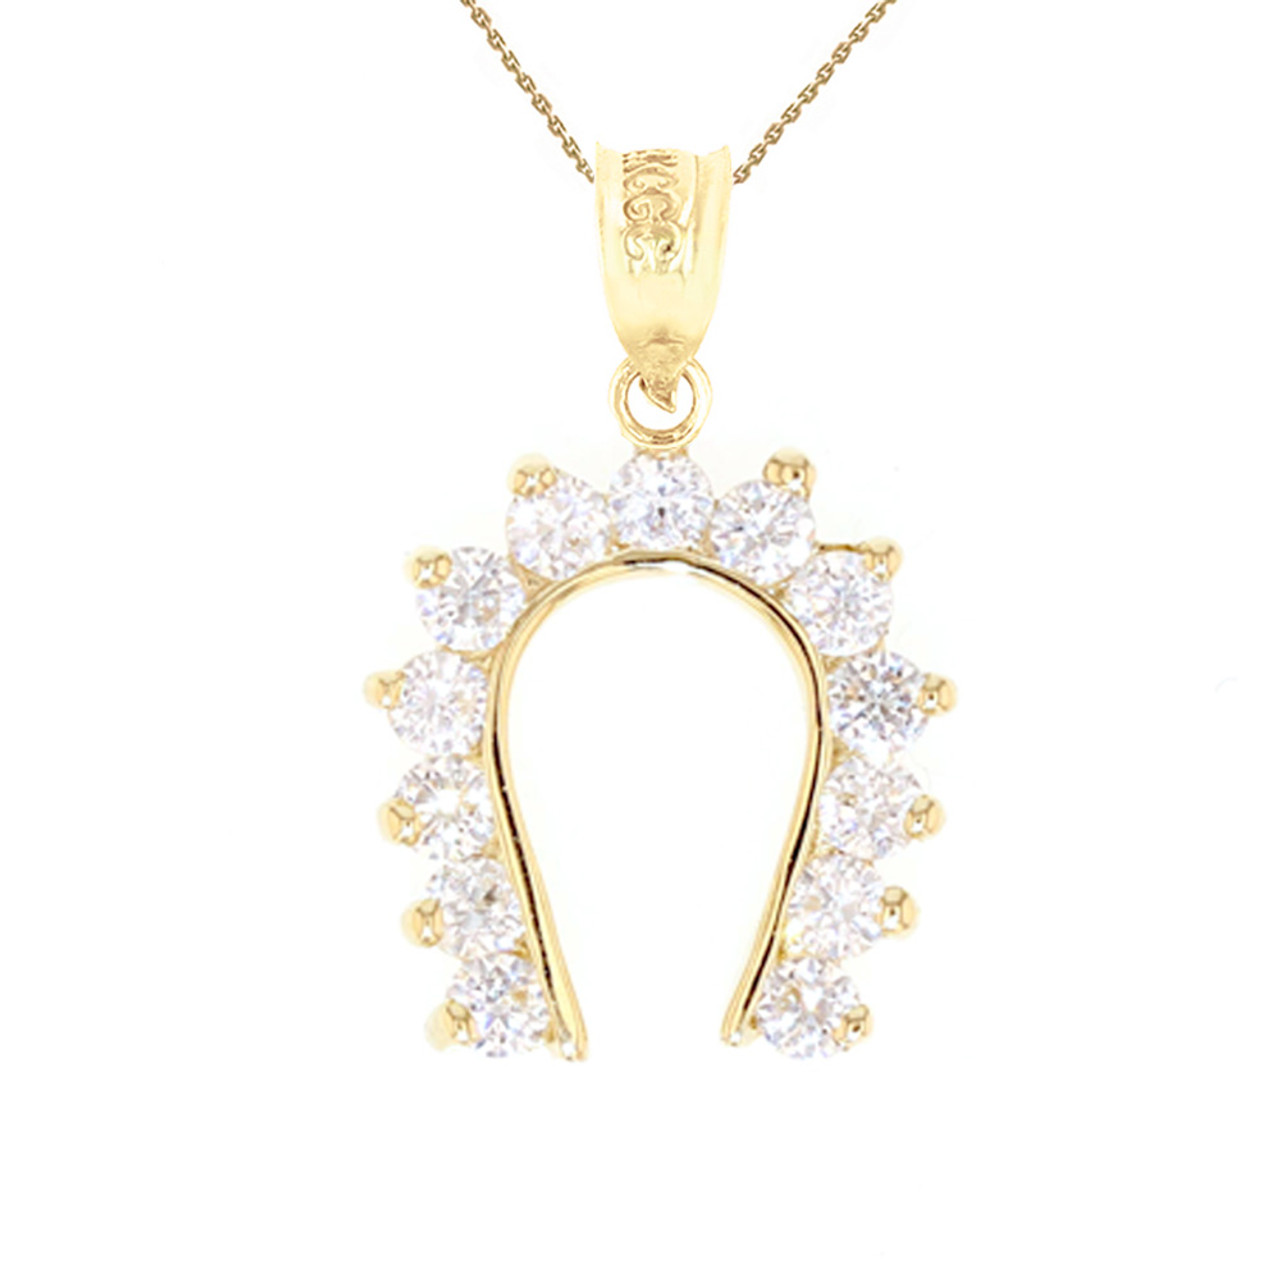 Yellow gold good luck horseshoe pendant necklace aloadofball Gallery